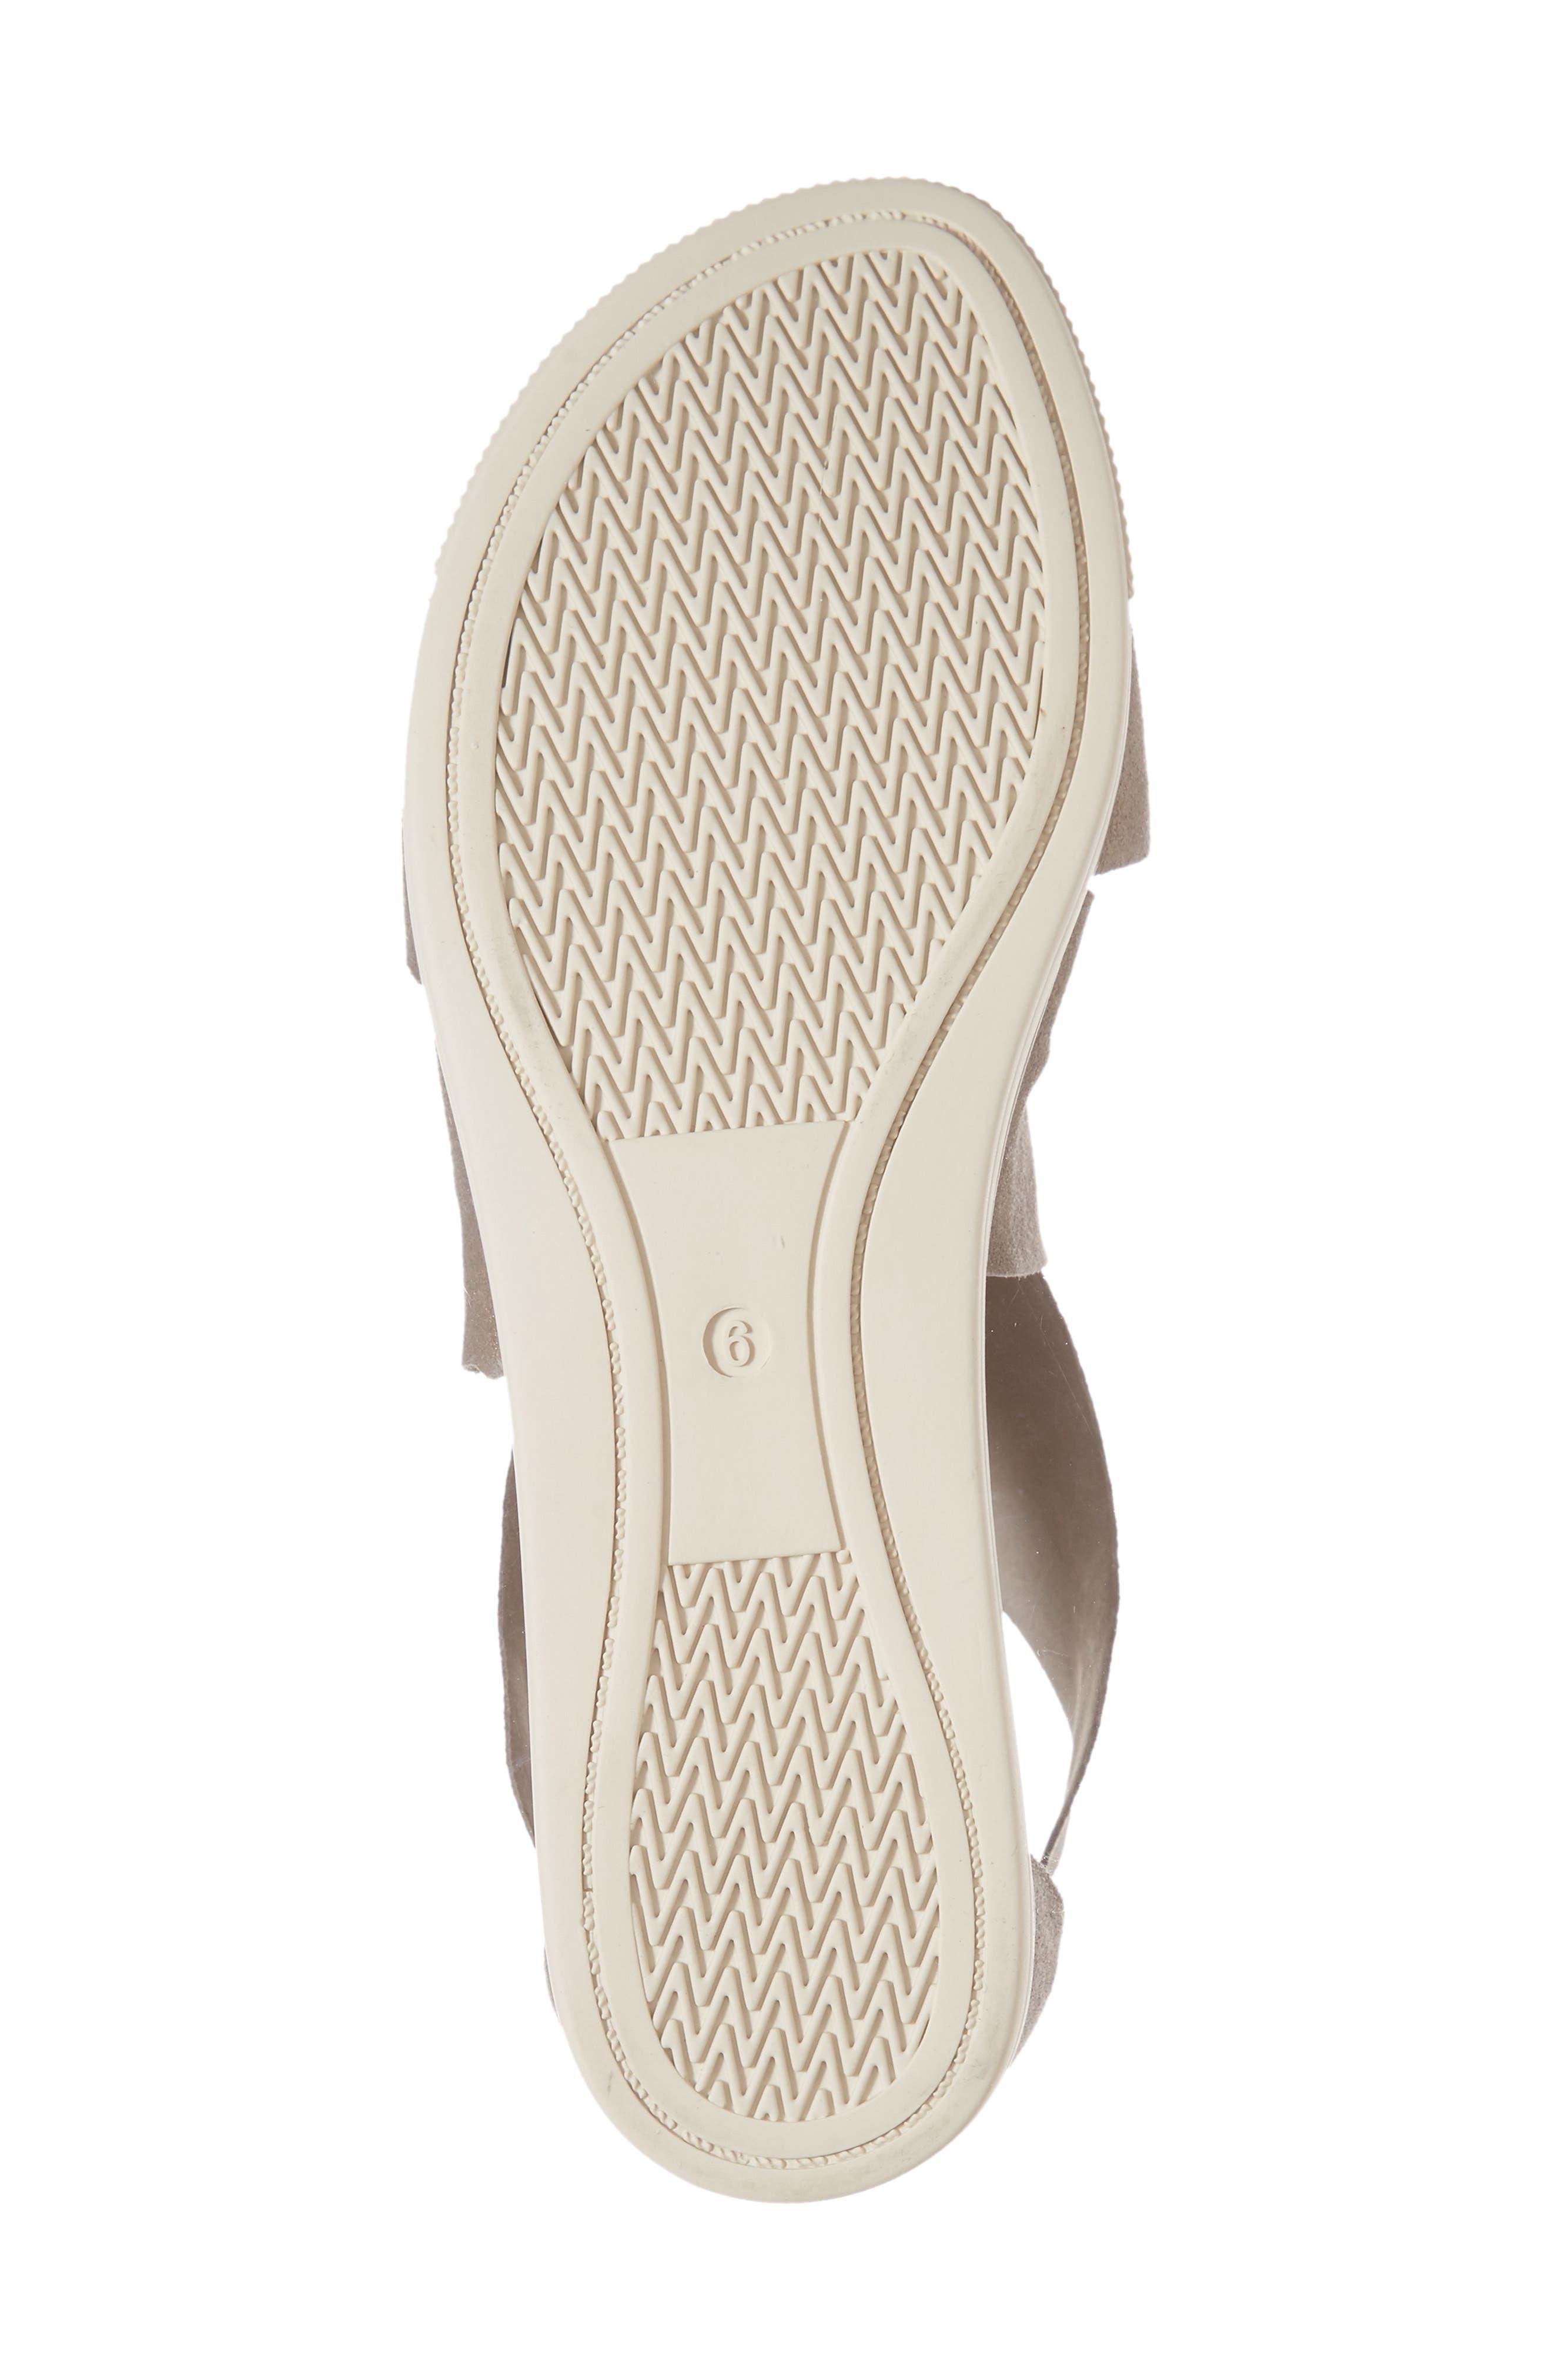 Sport Platform Sandal,                             Alternate thumbnail 6, color,                             PLATINUM LEATHER